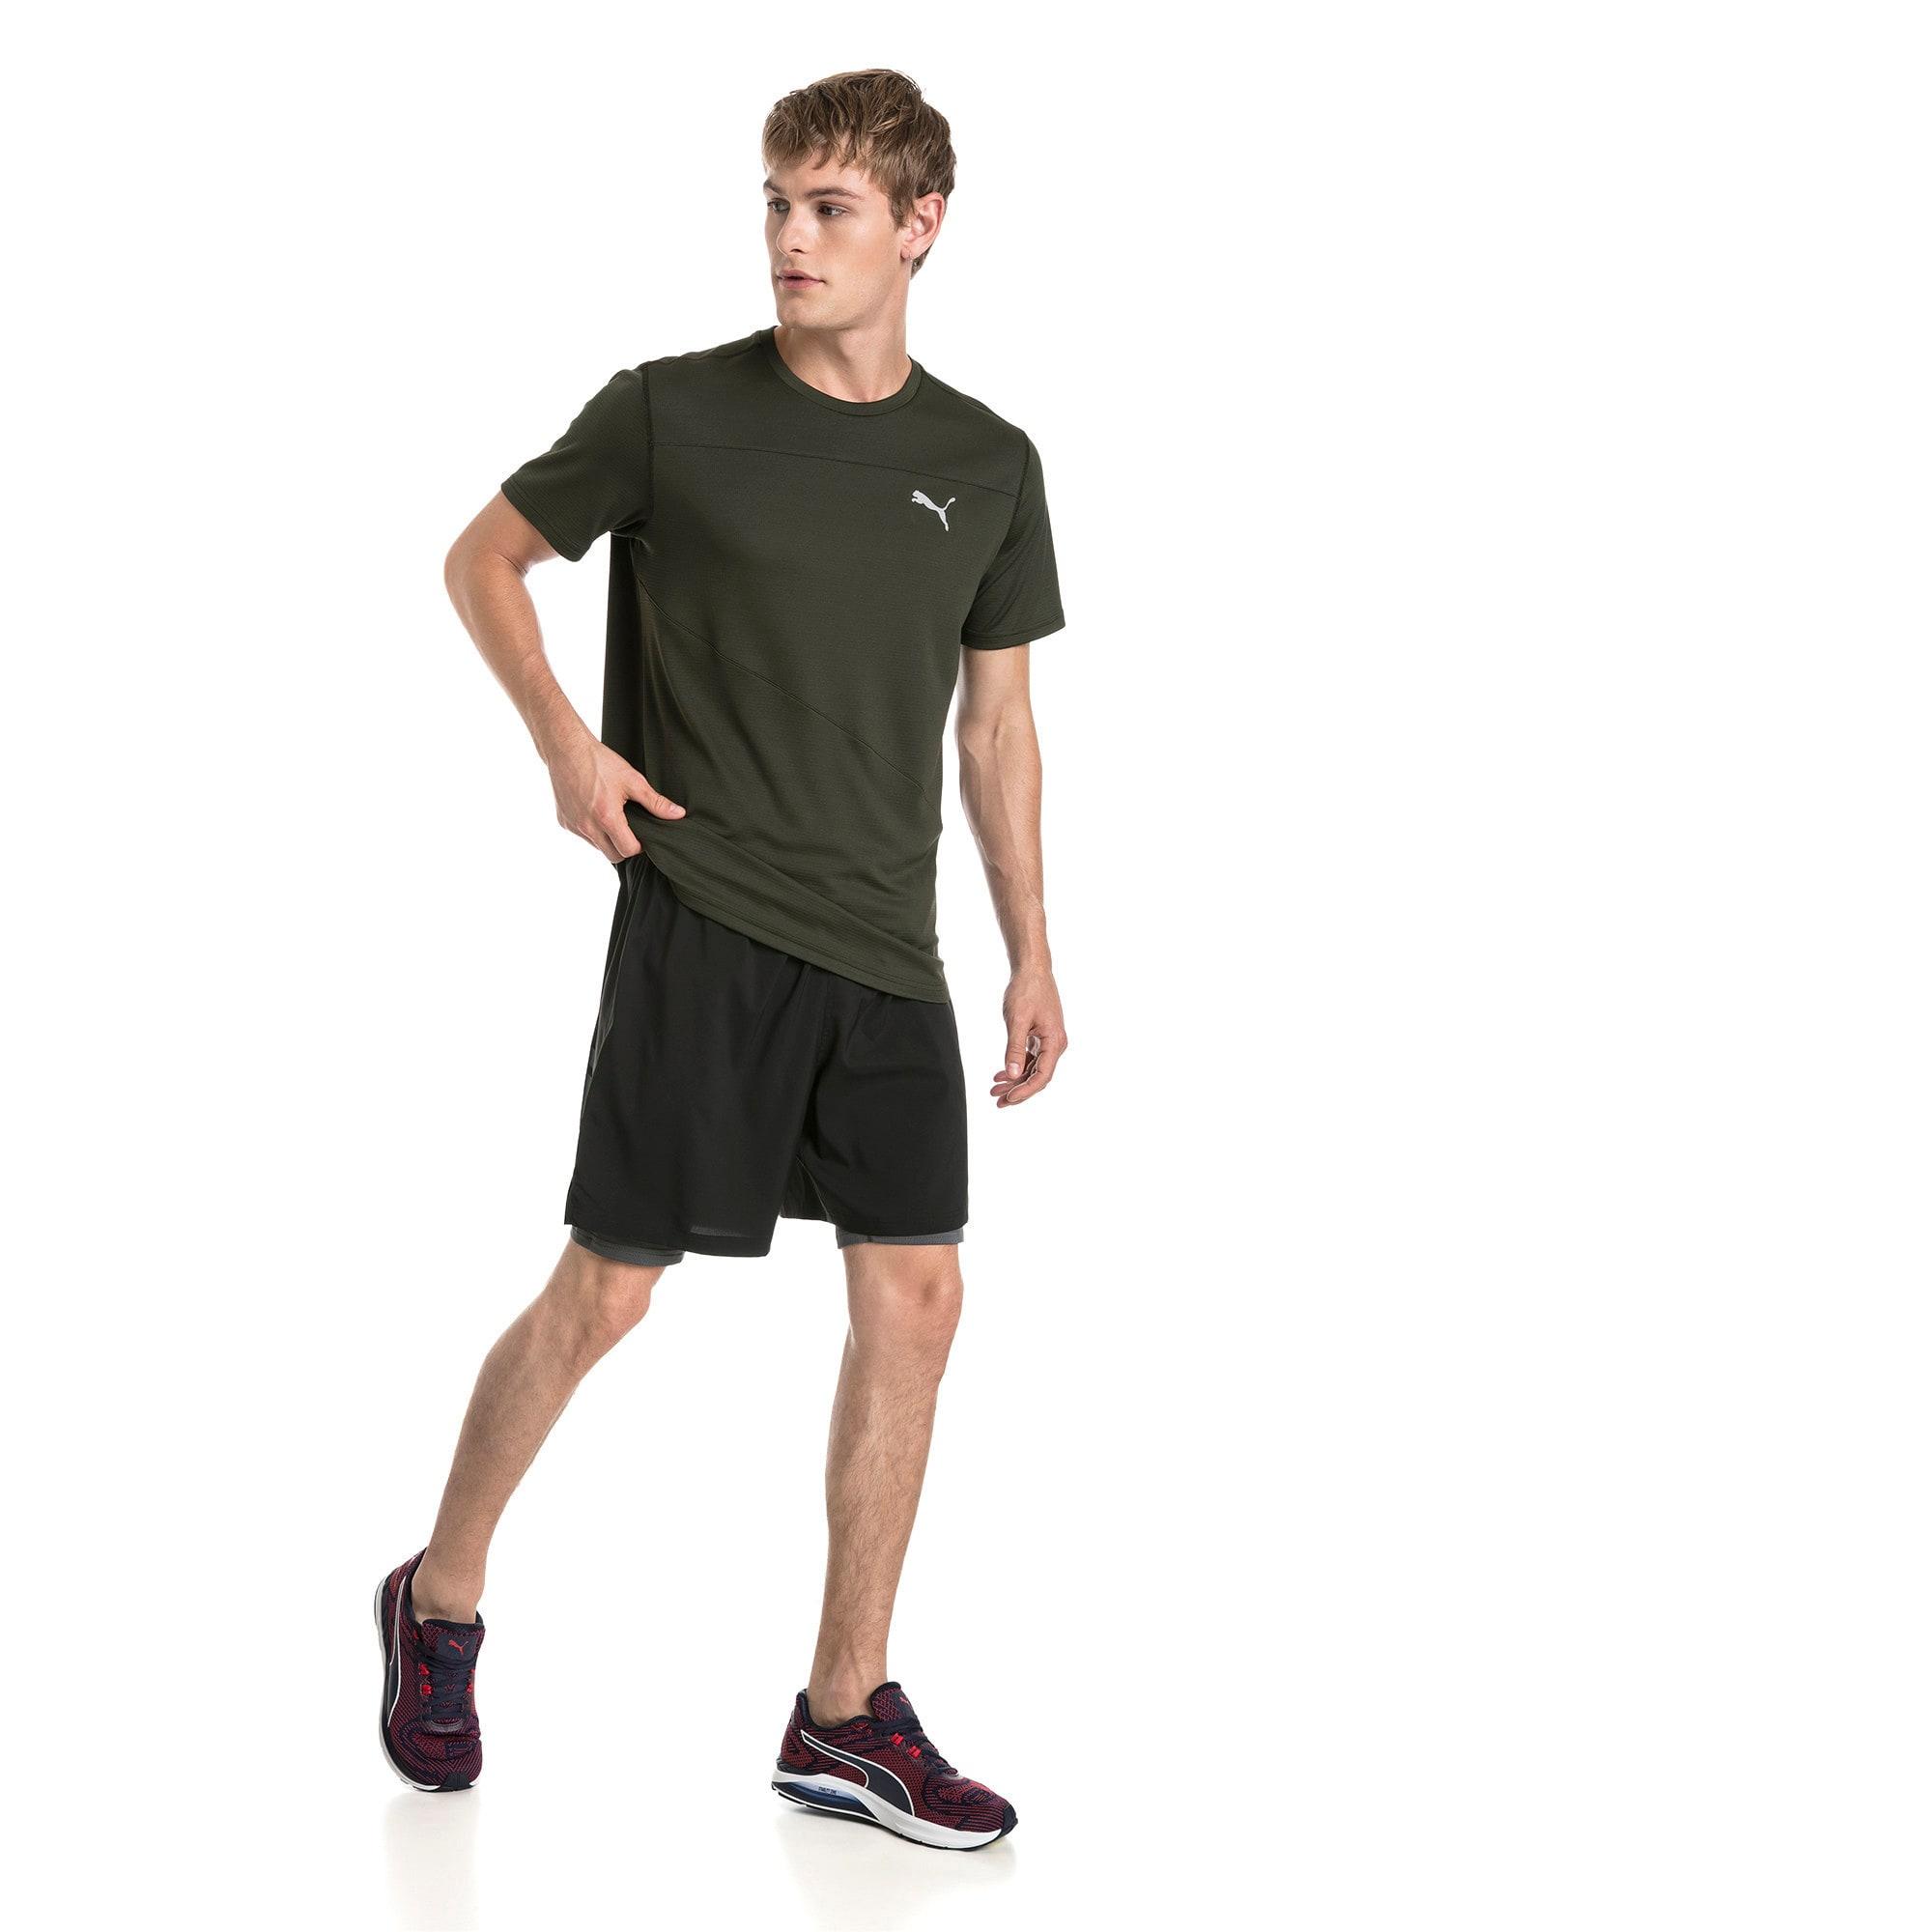 Thumbnail 3 of Running Men's IGNITE Mono T-Shirt, Forest Night, medium-IND